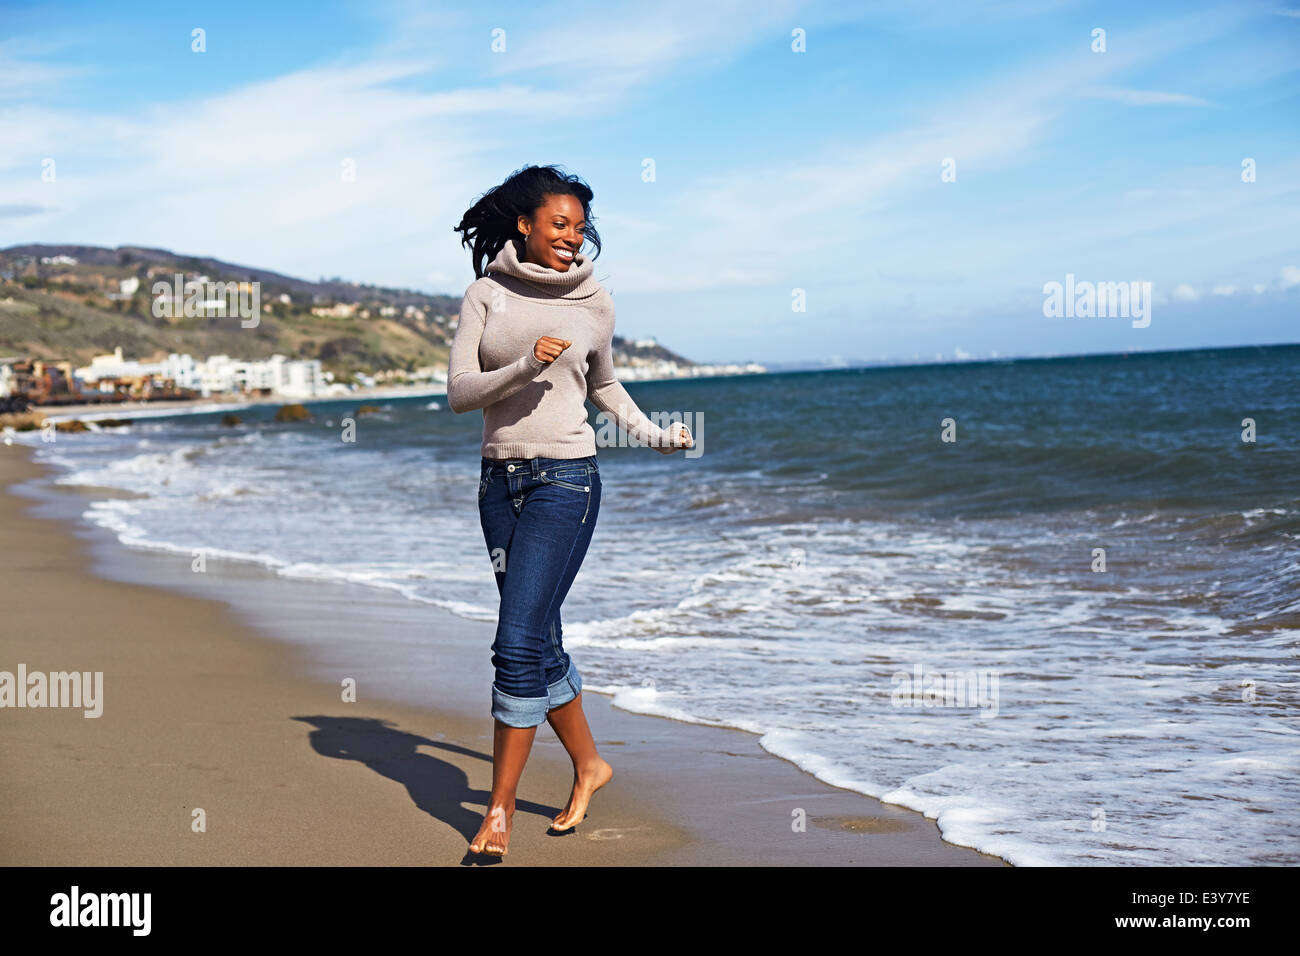 Jeune femme marchant pieds nus sur la plage, Malibu, California, USA Photo Stock